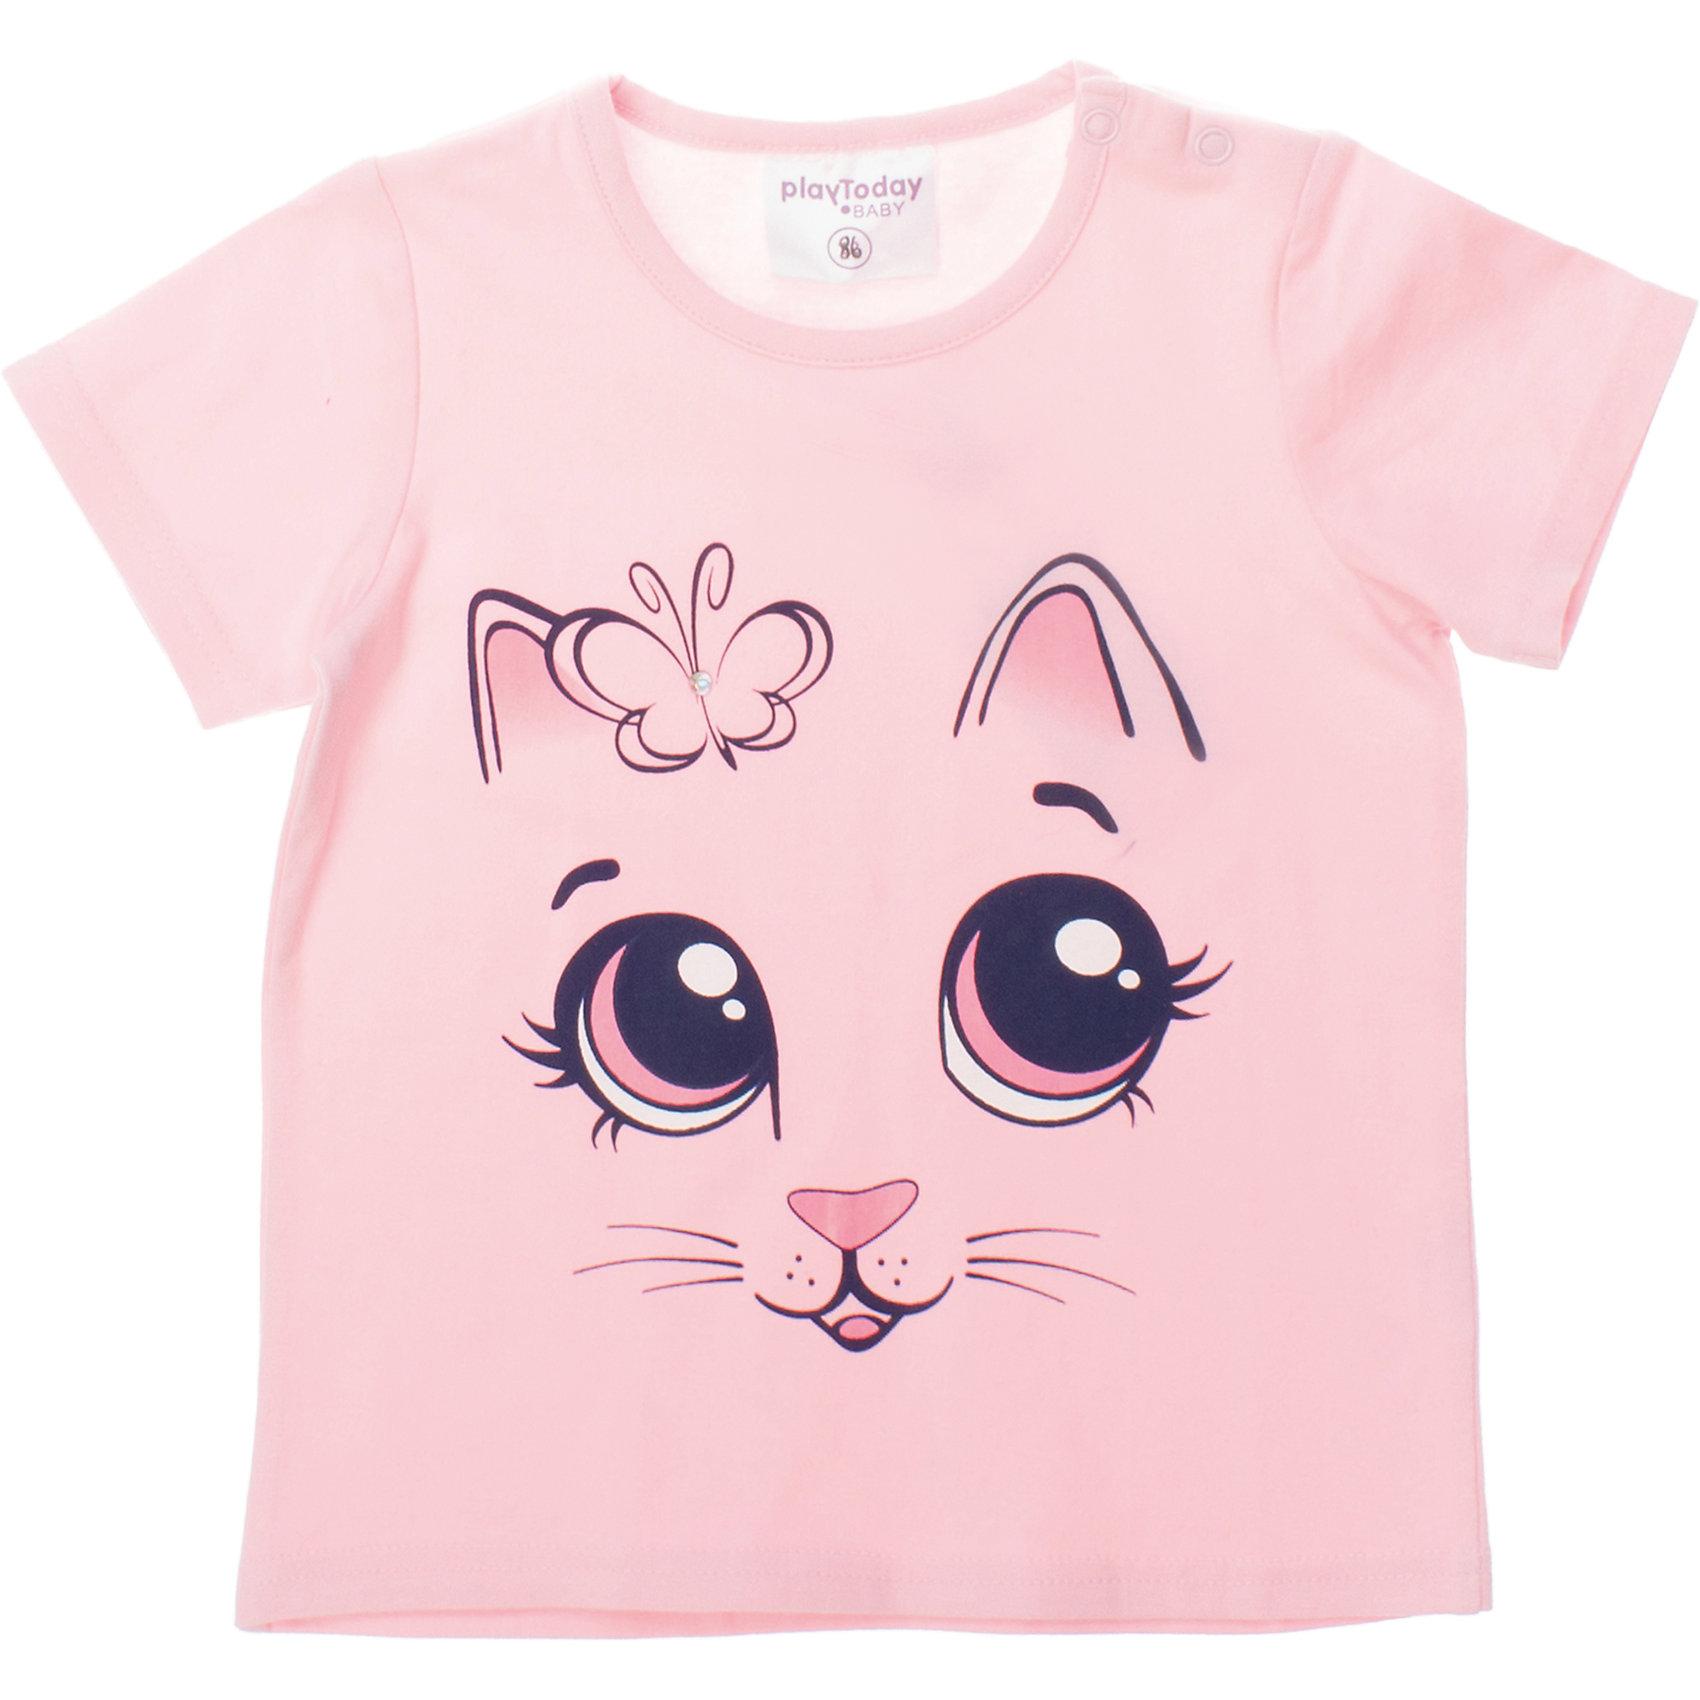 PlayToday Футболка для девочки PlayToday футболка для девочки bj9801 розовый byblos